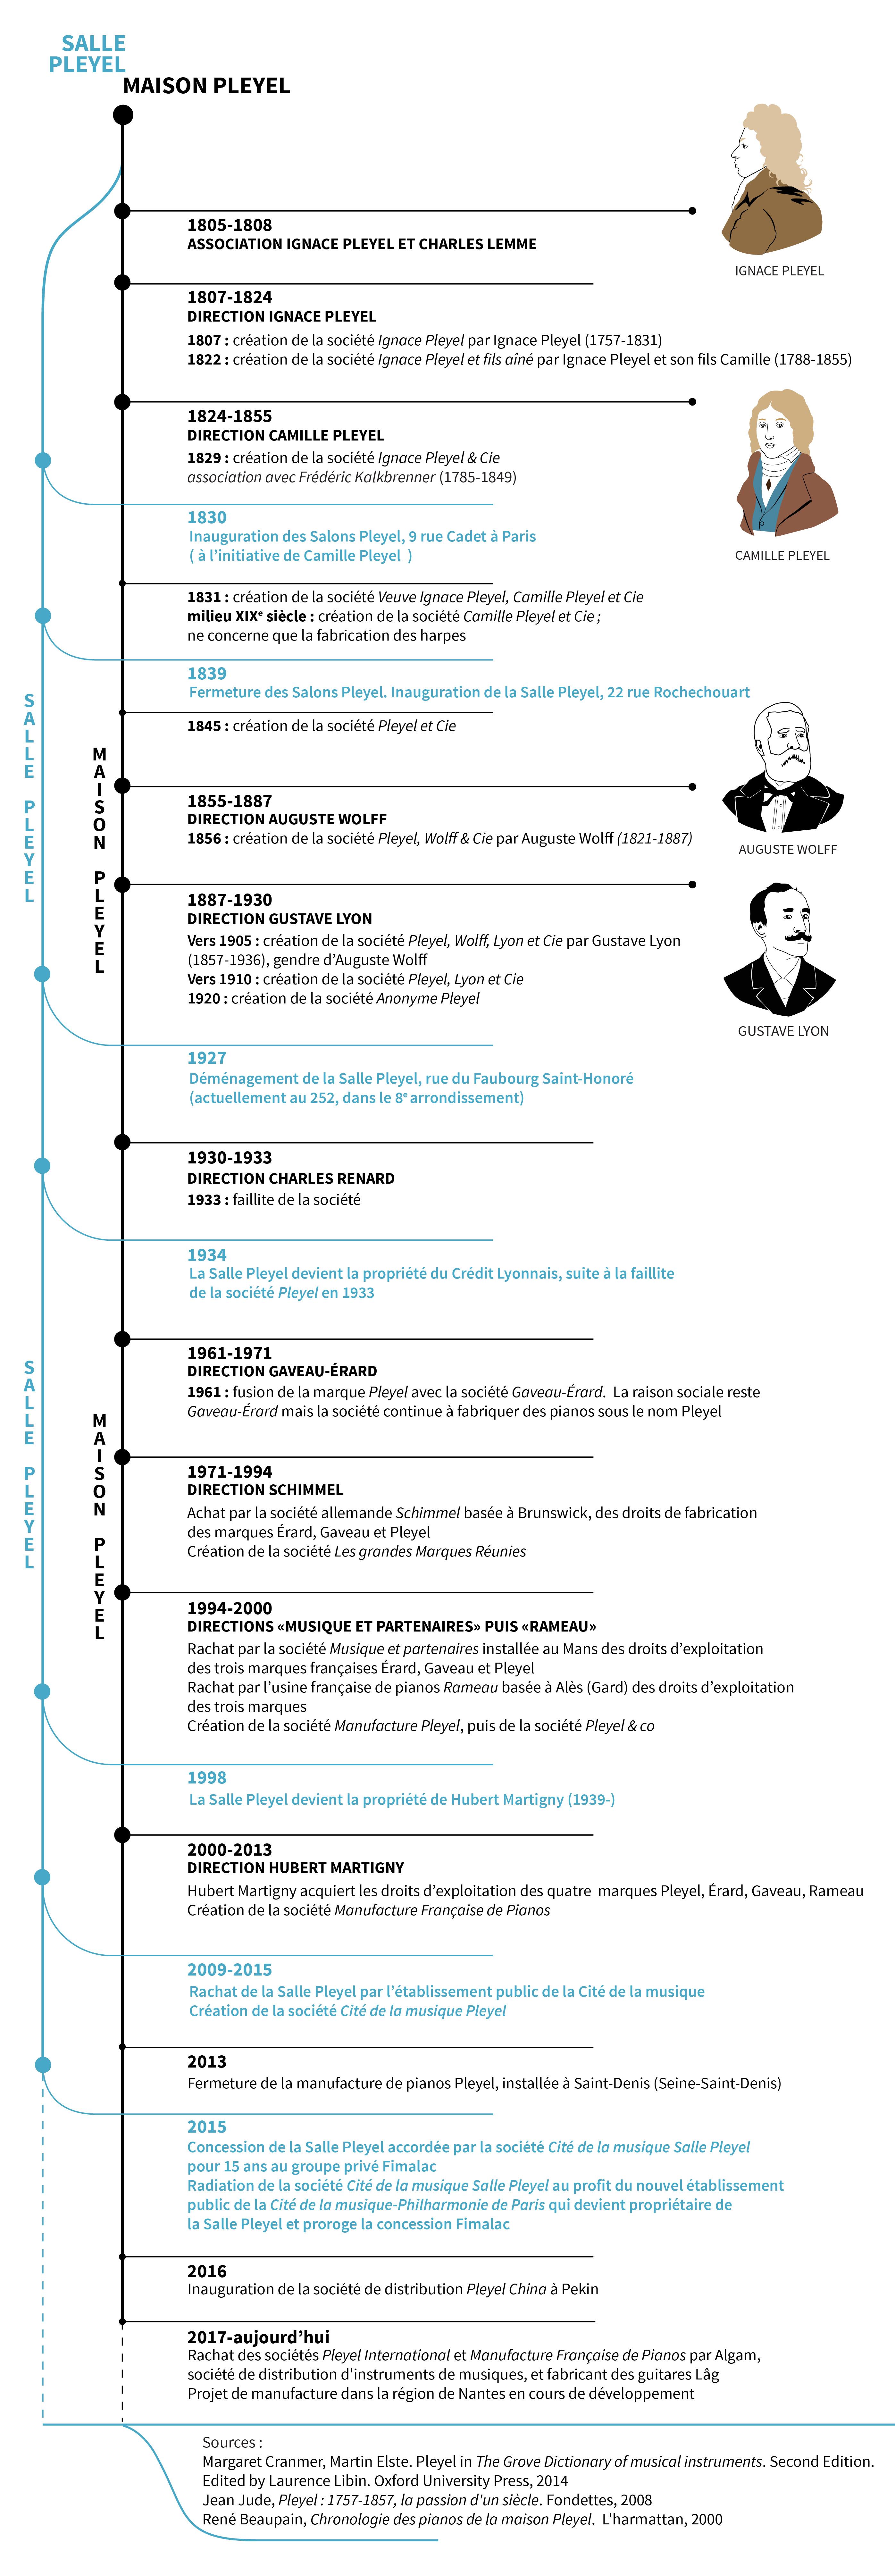 Chronologie de la maison Pleyel